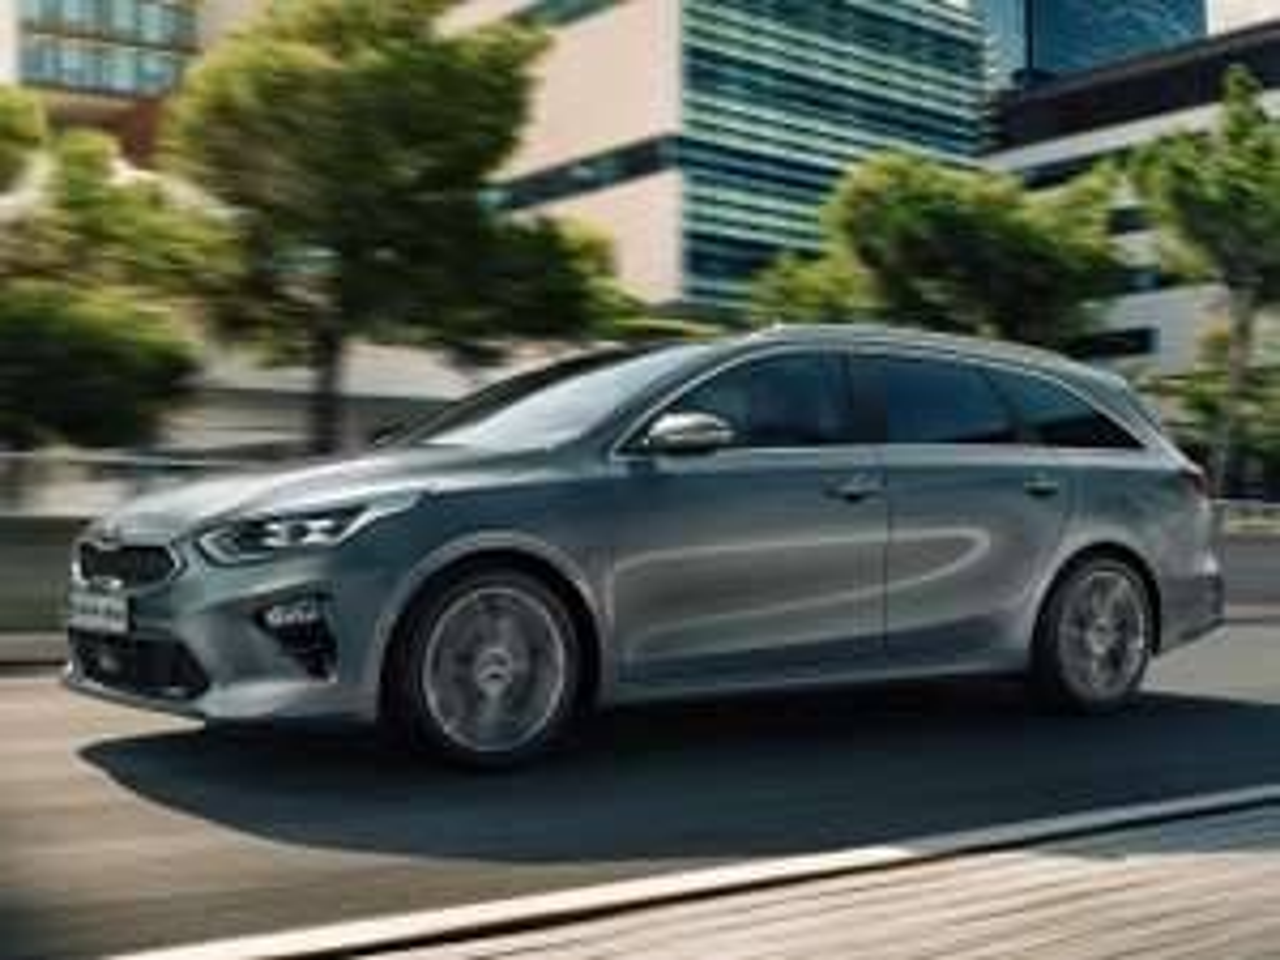 Gewerbe-Leasing: 79€ mtl. Kia Ceed Sportswagon Vision 1.6 GDI Plug-in-Hybrid (LF: 0,33)